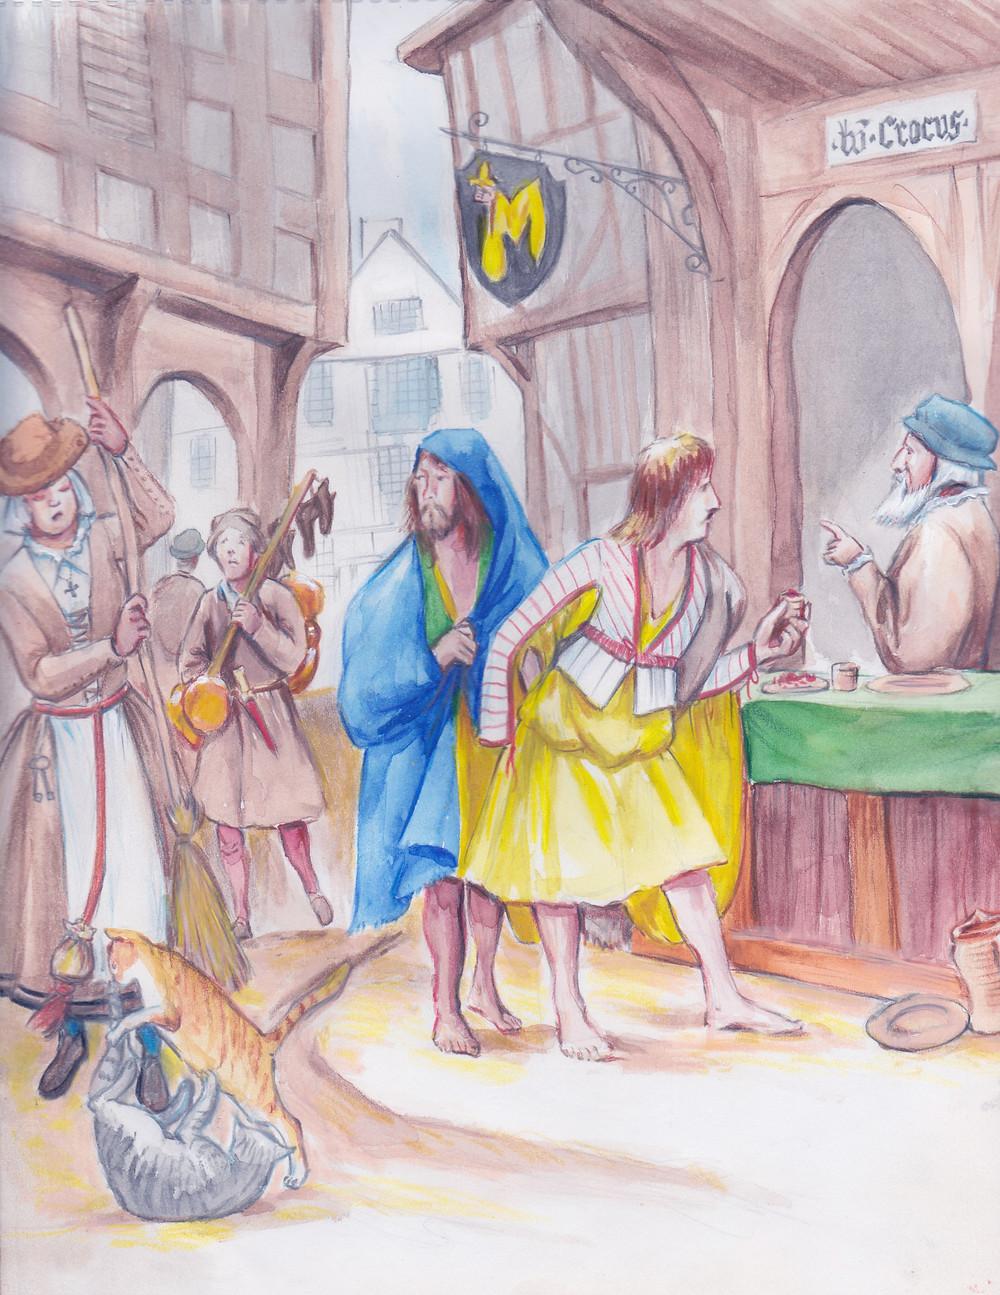 street scene, 16th century Kilkenny, Irish kern buying saffron from merchant